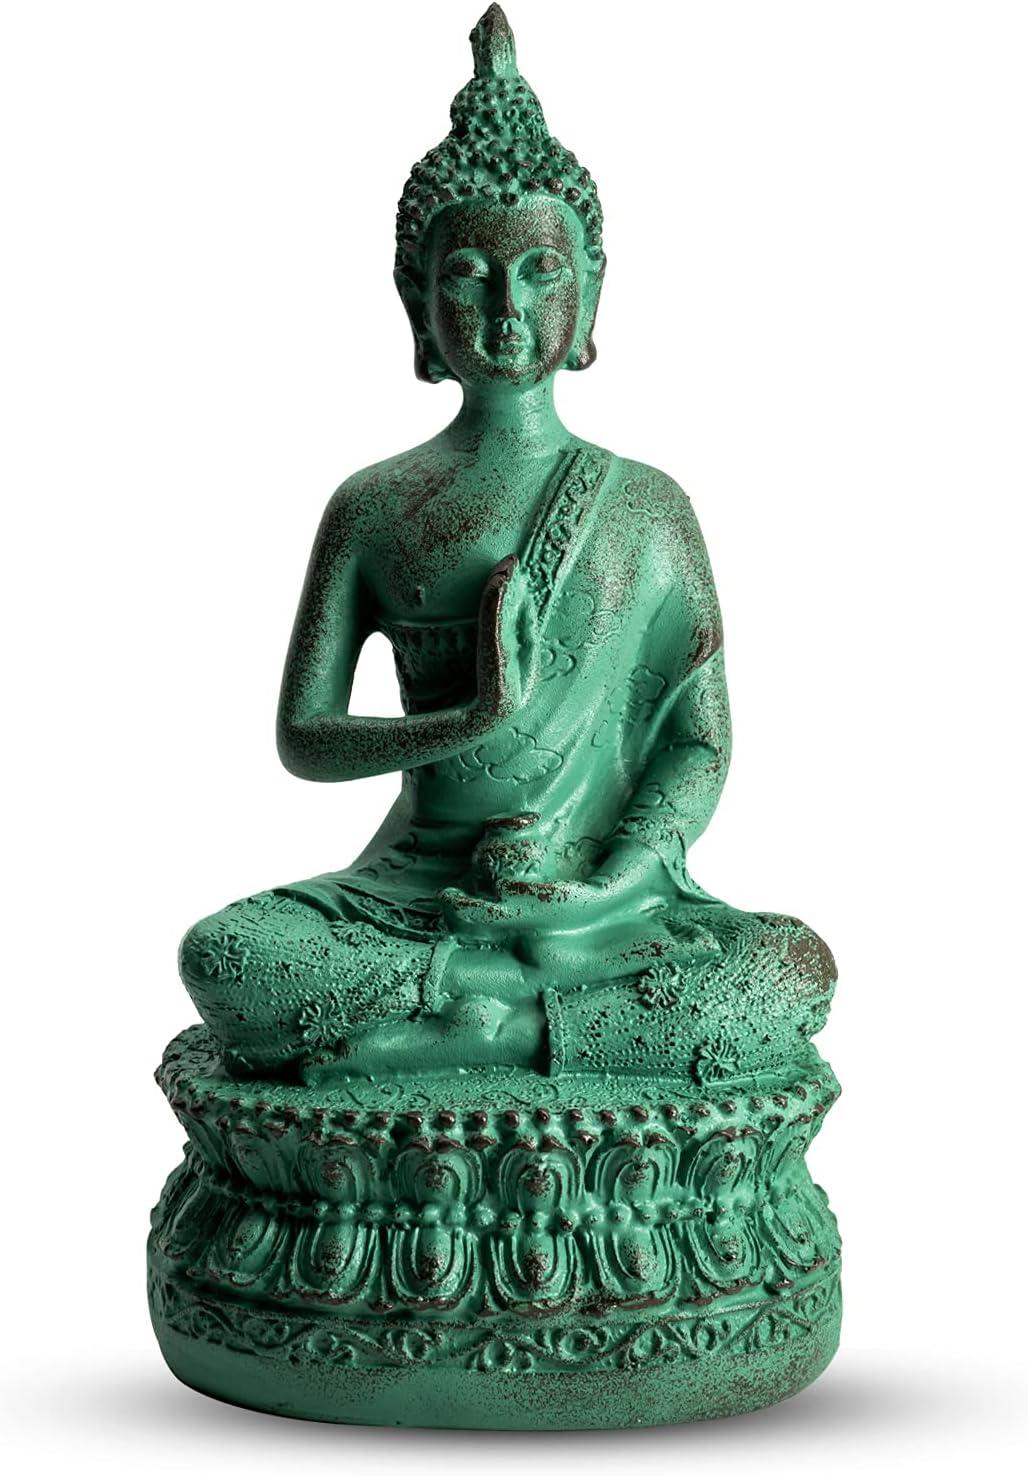 CYYKDA Buddha Statues for Home. 7